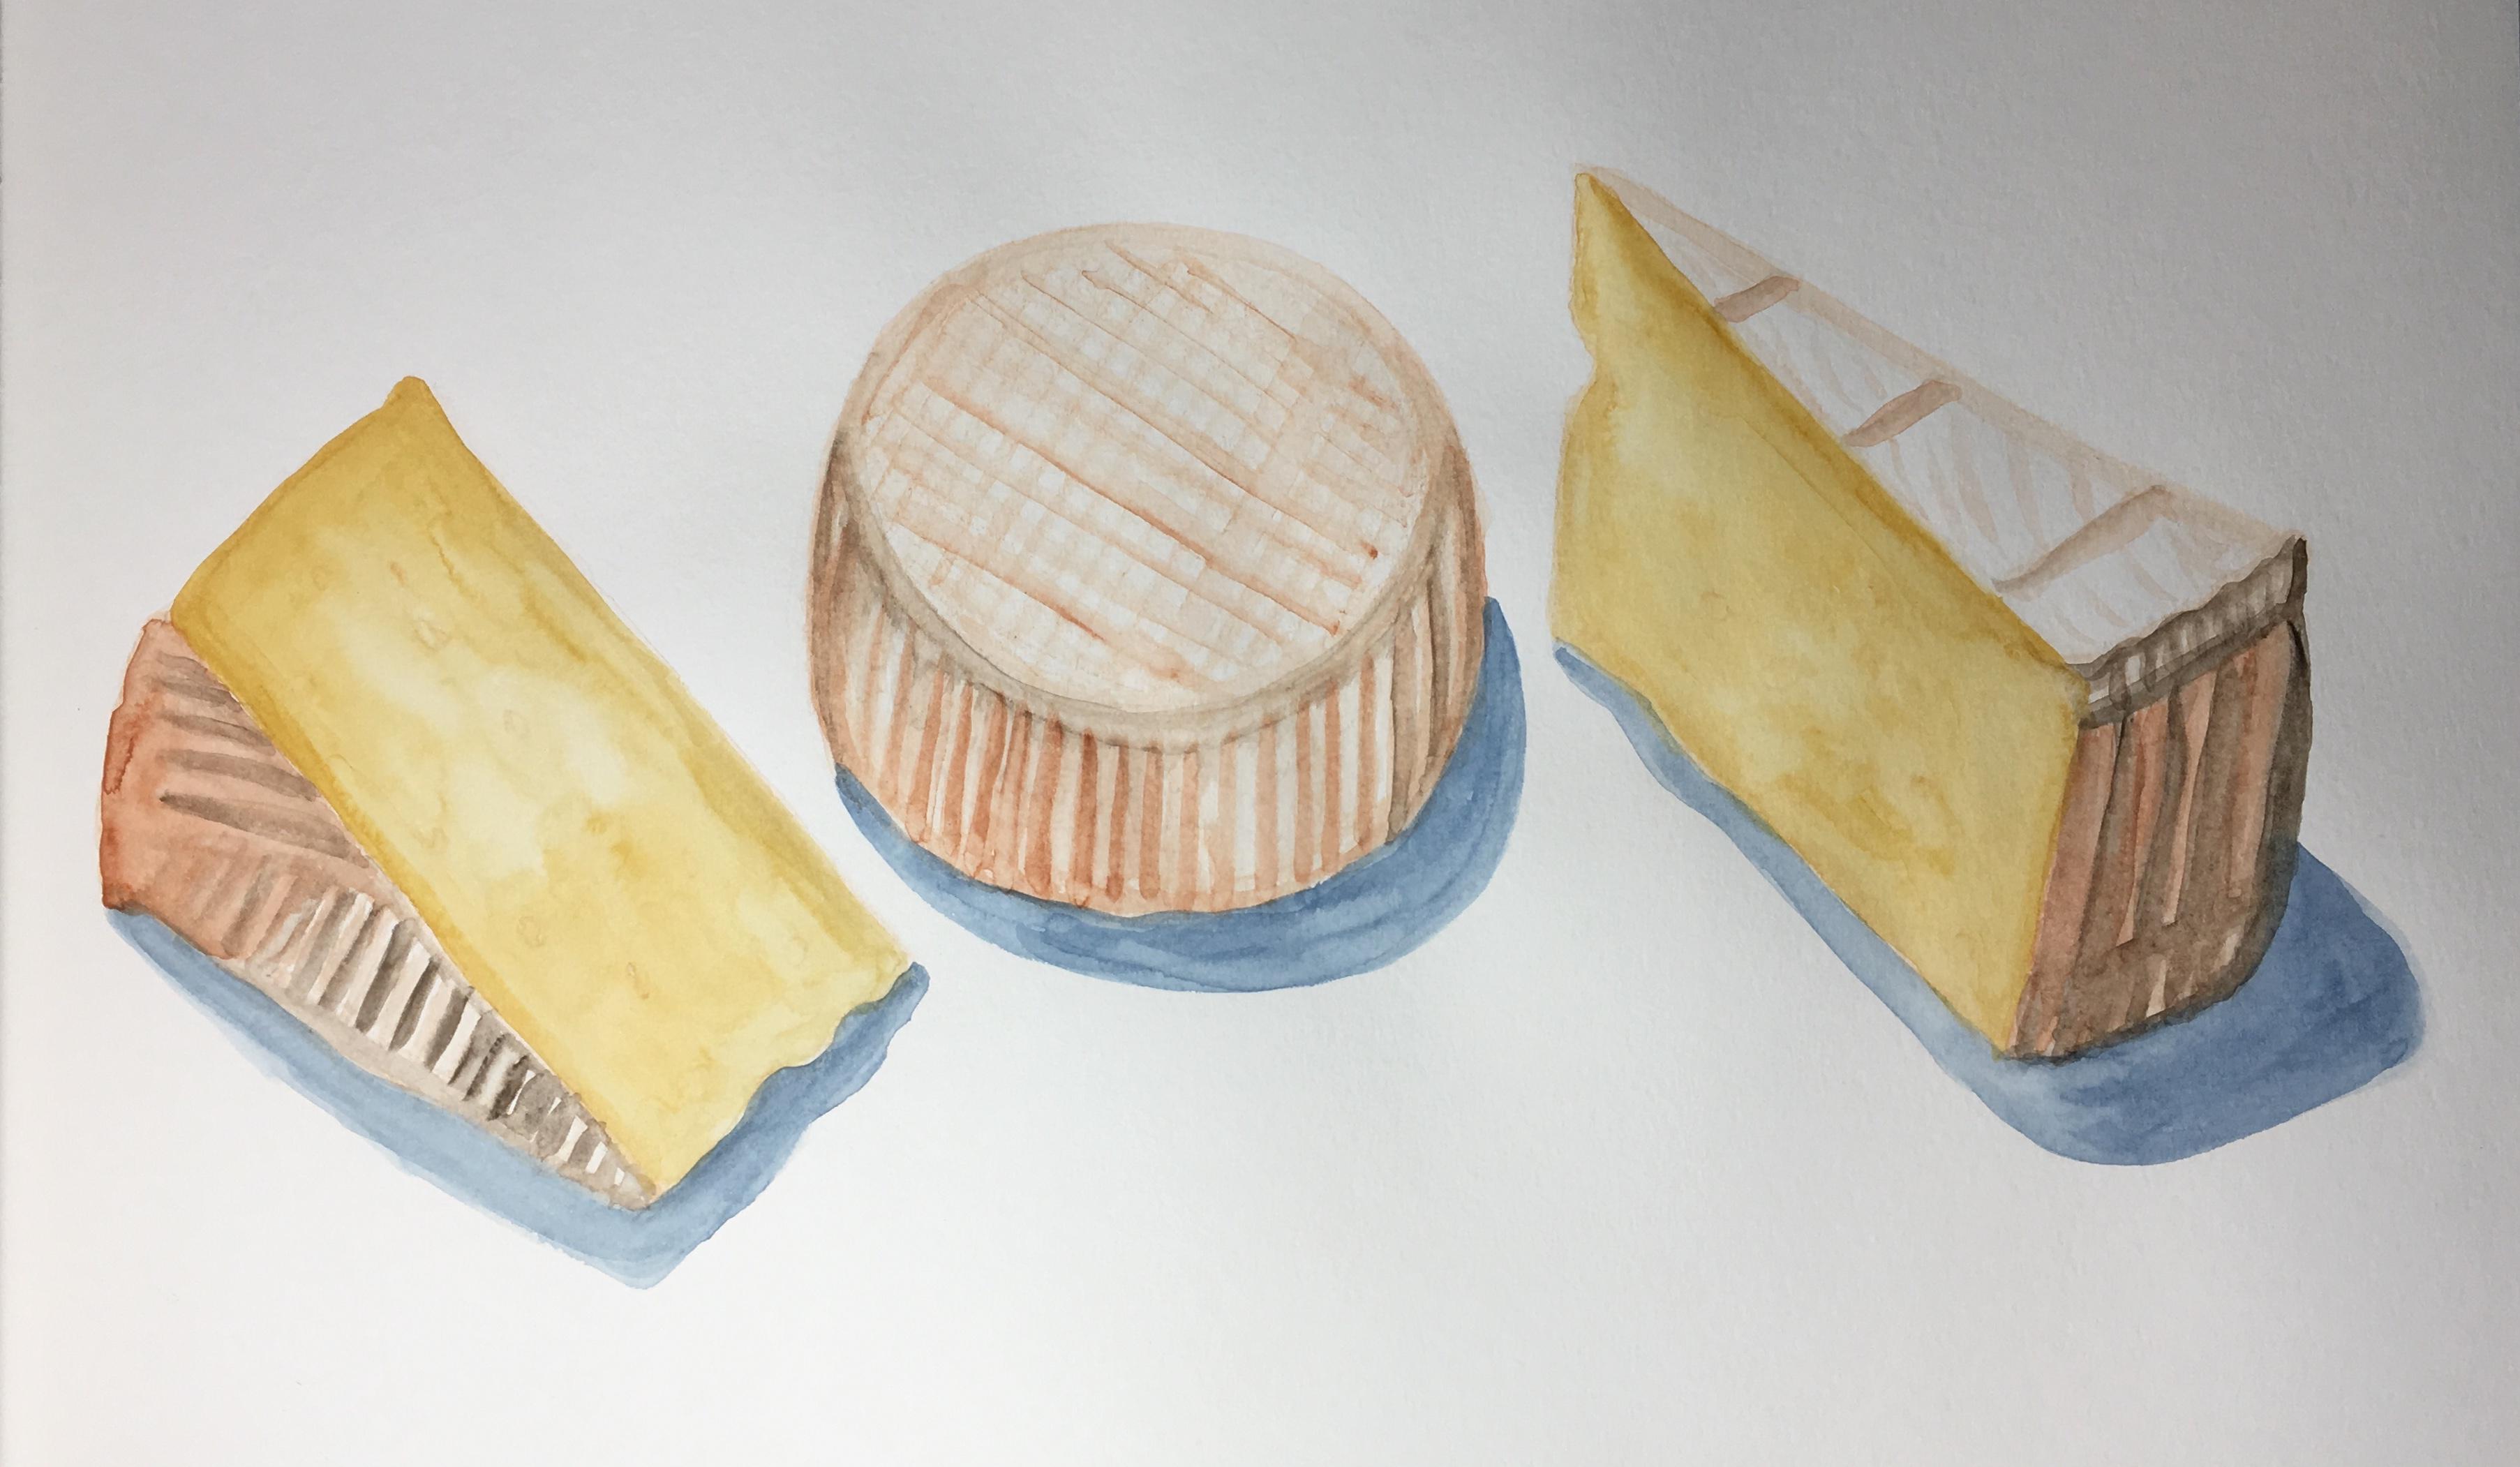 """Three cheeses"" December 2018"